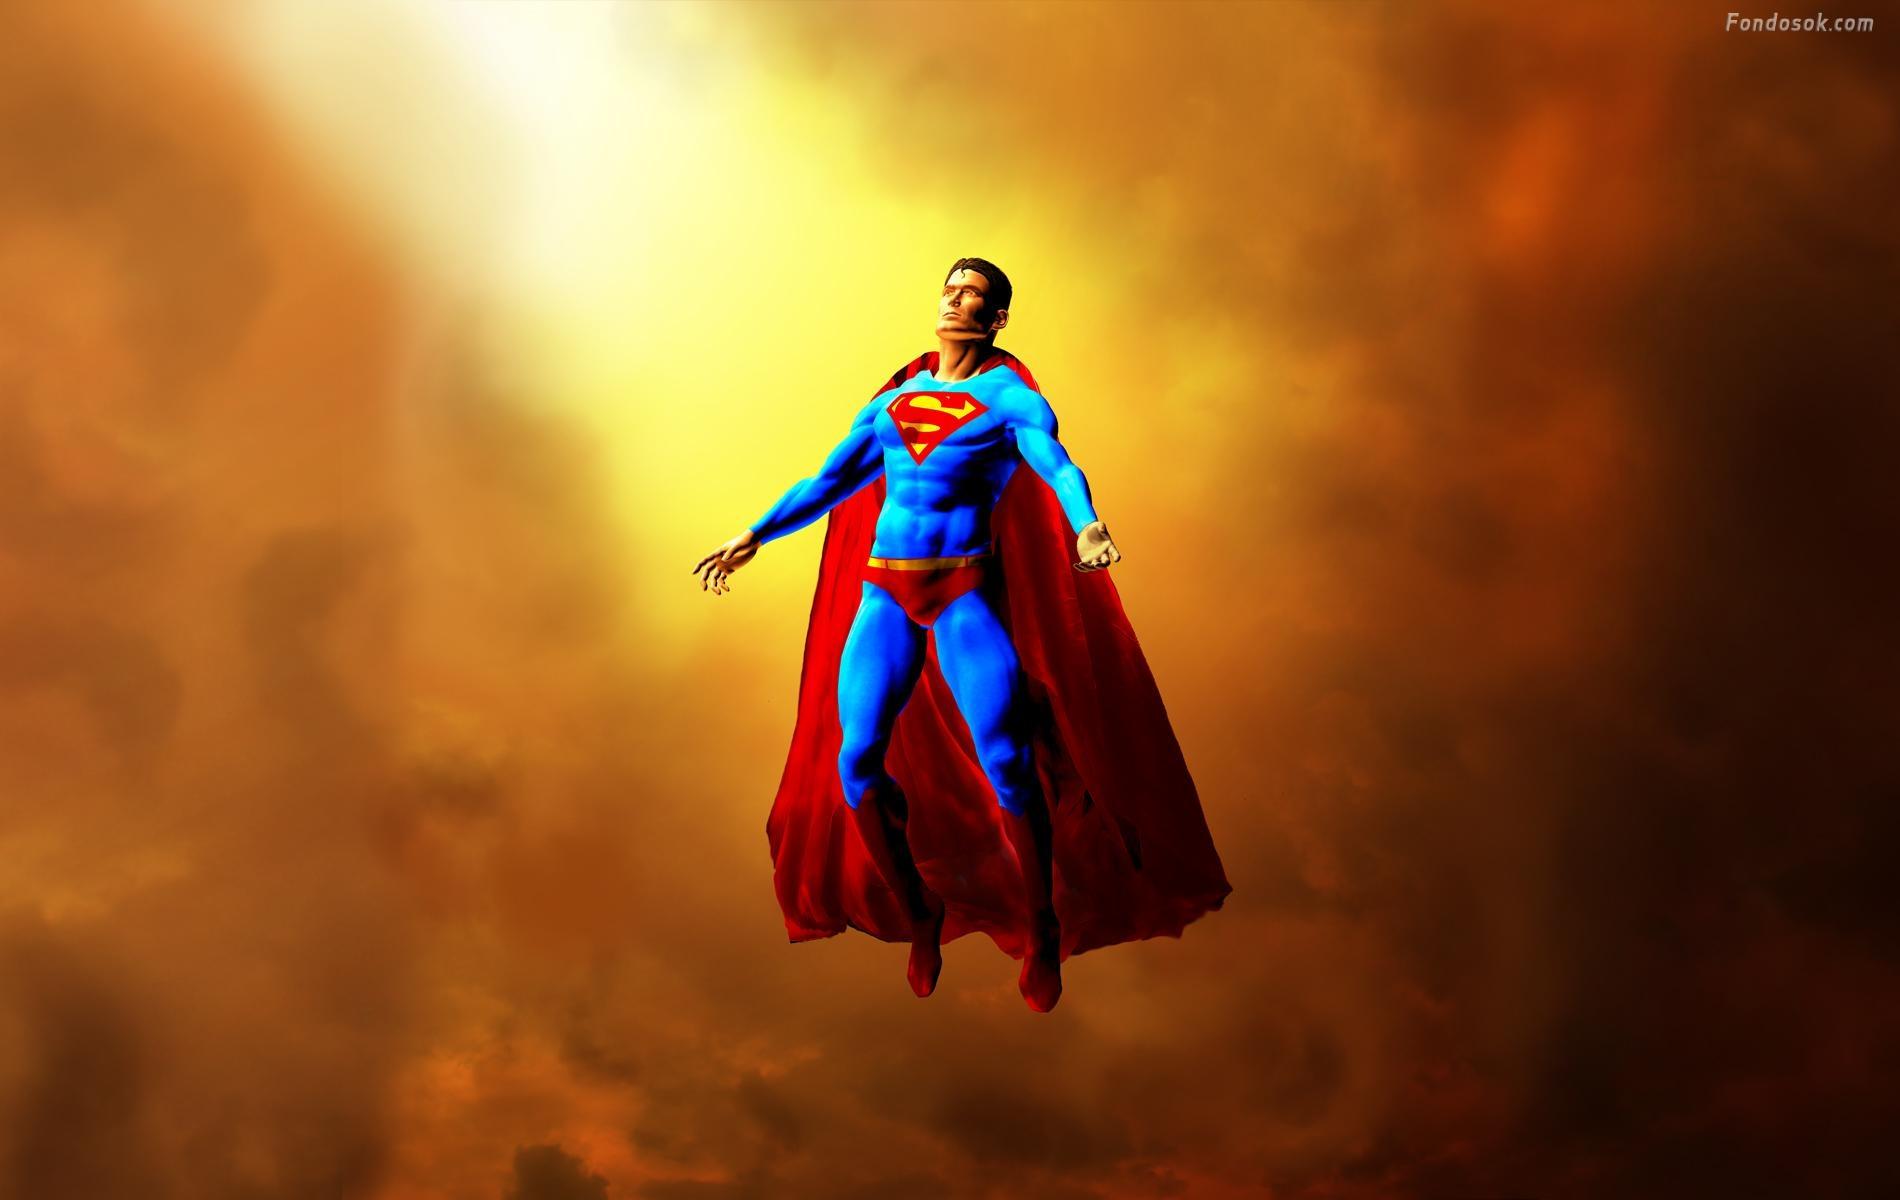 Superman Wallpaper Widescreen Wide Screen Wallpaper 1080p2K4K 1900x1200